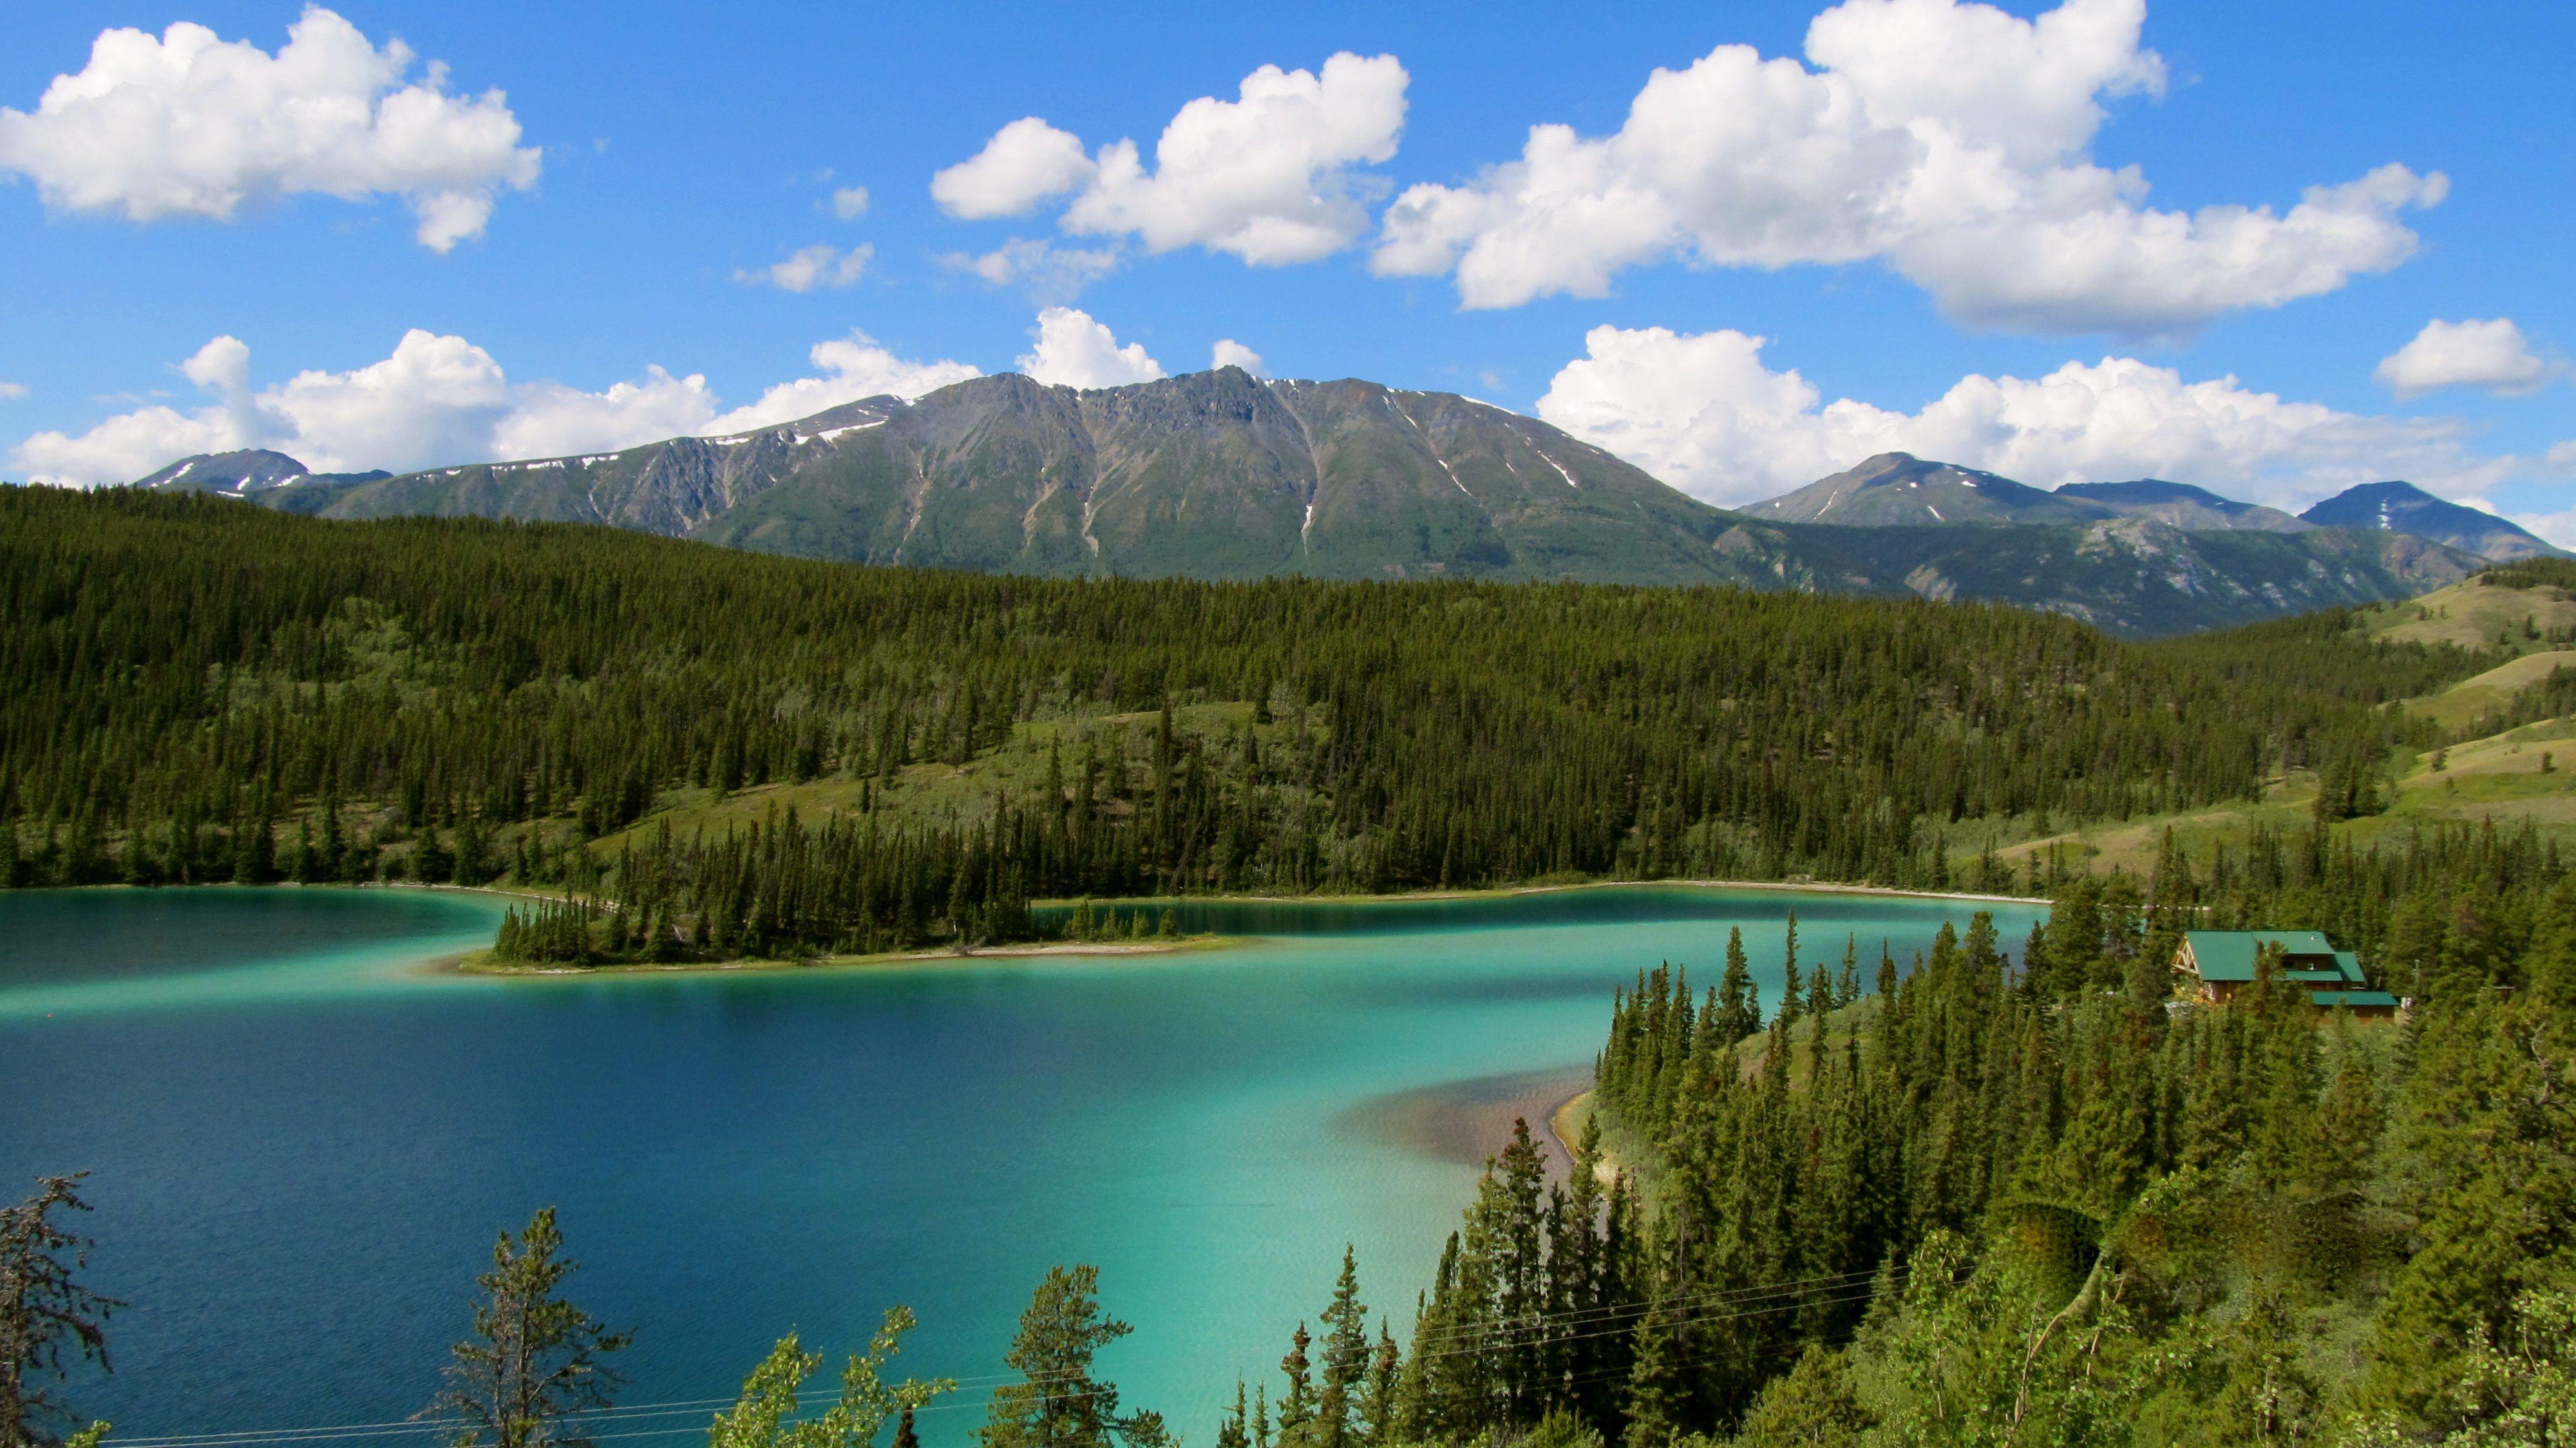 Emerald Lake, Whitehorse, Yukon Photograph by Mike